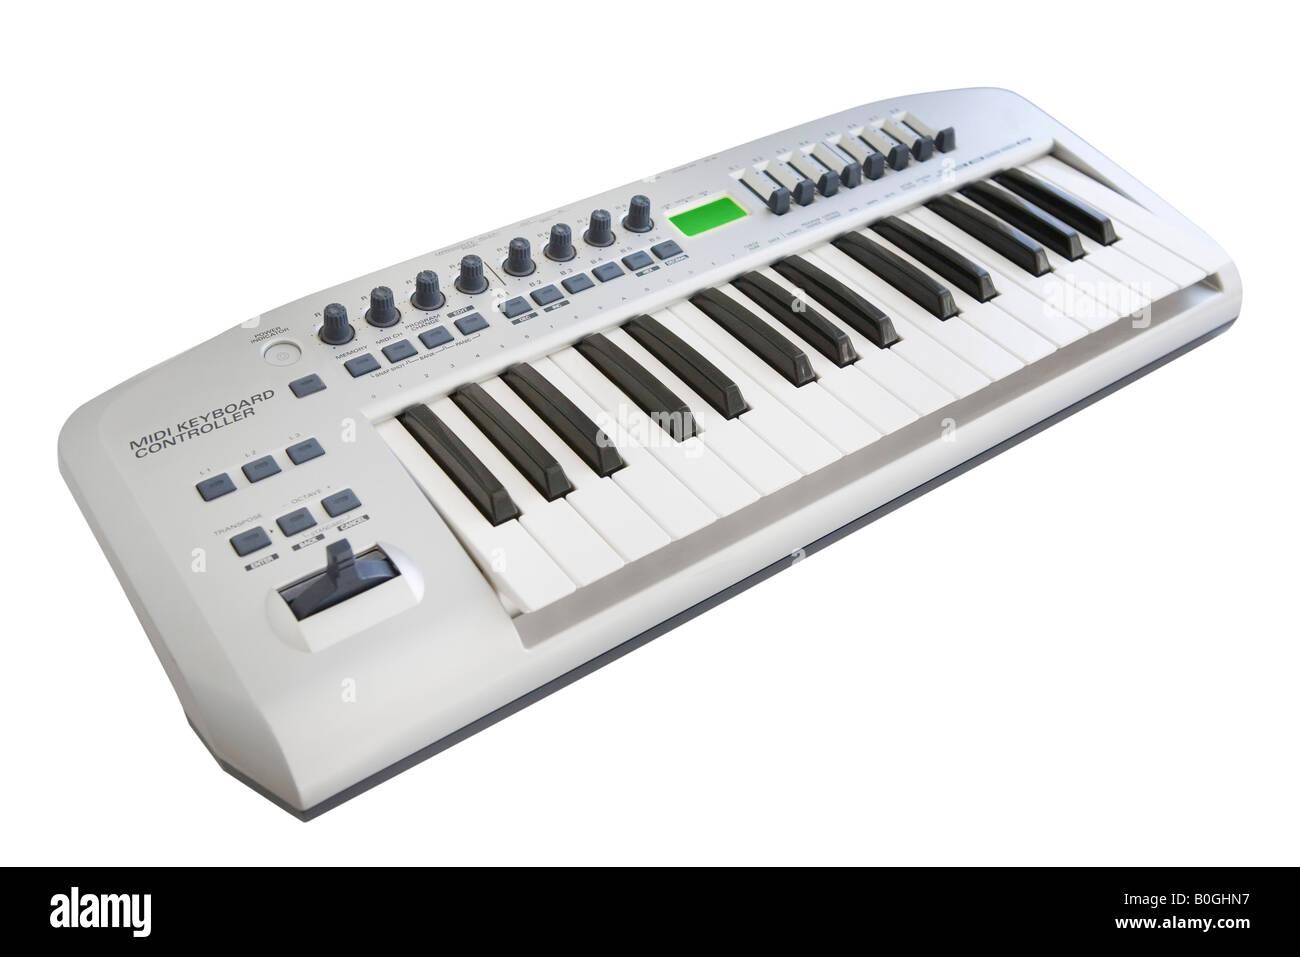 Electronic keyboard over white background - Stock Image